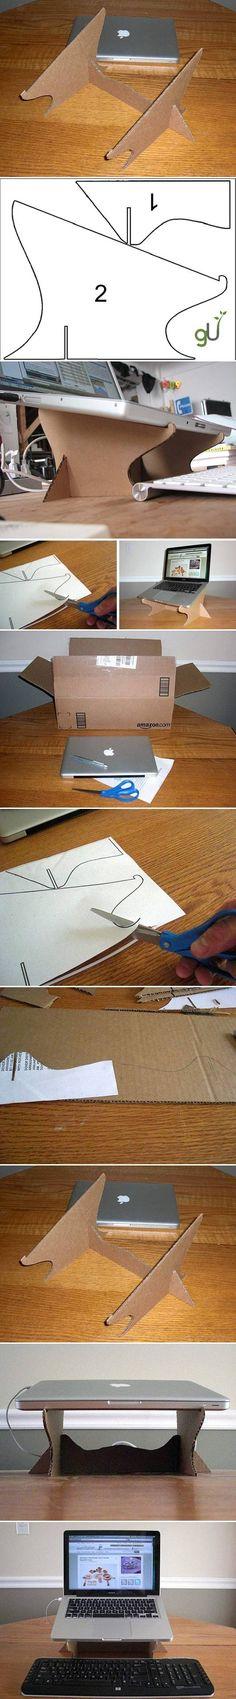 DIY Simple Cardboard Laptop Stand